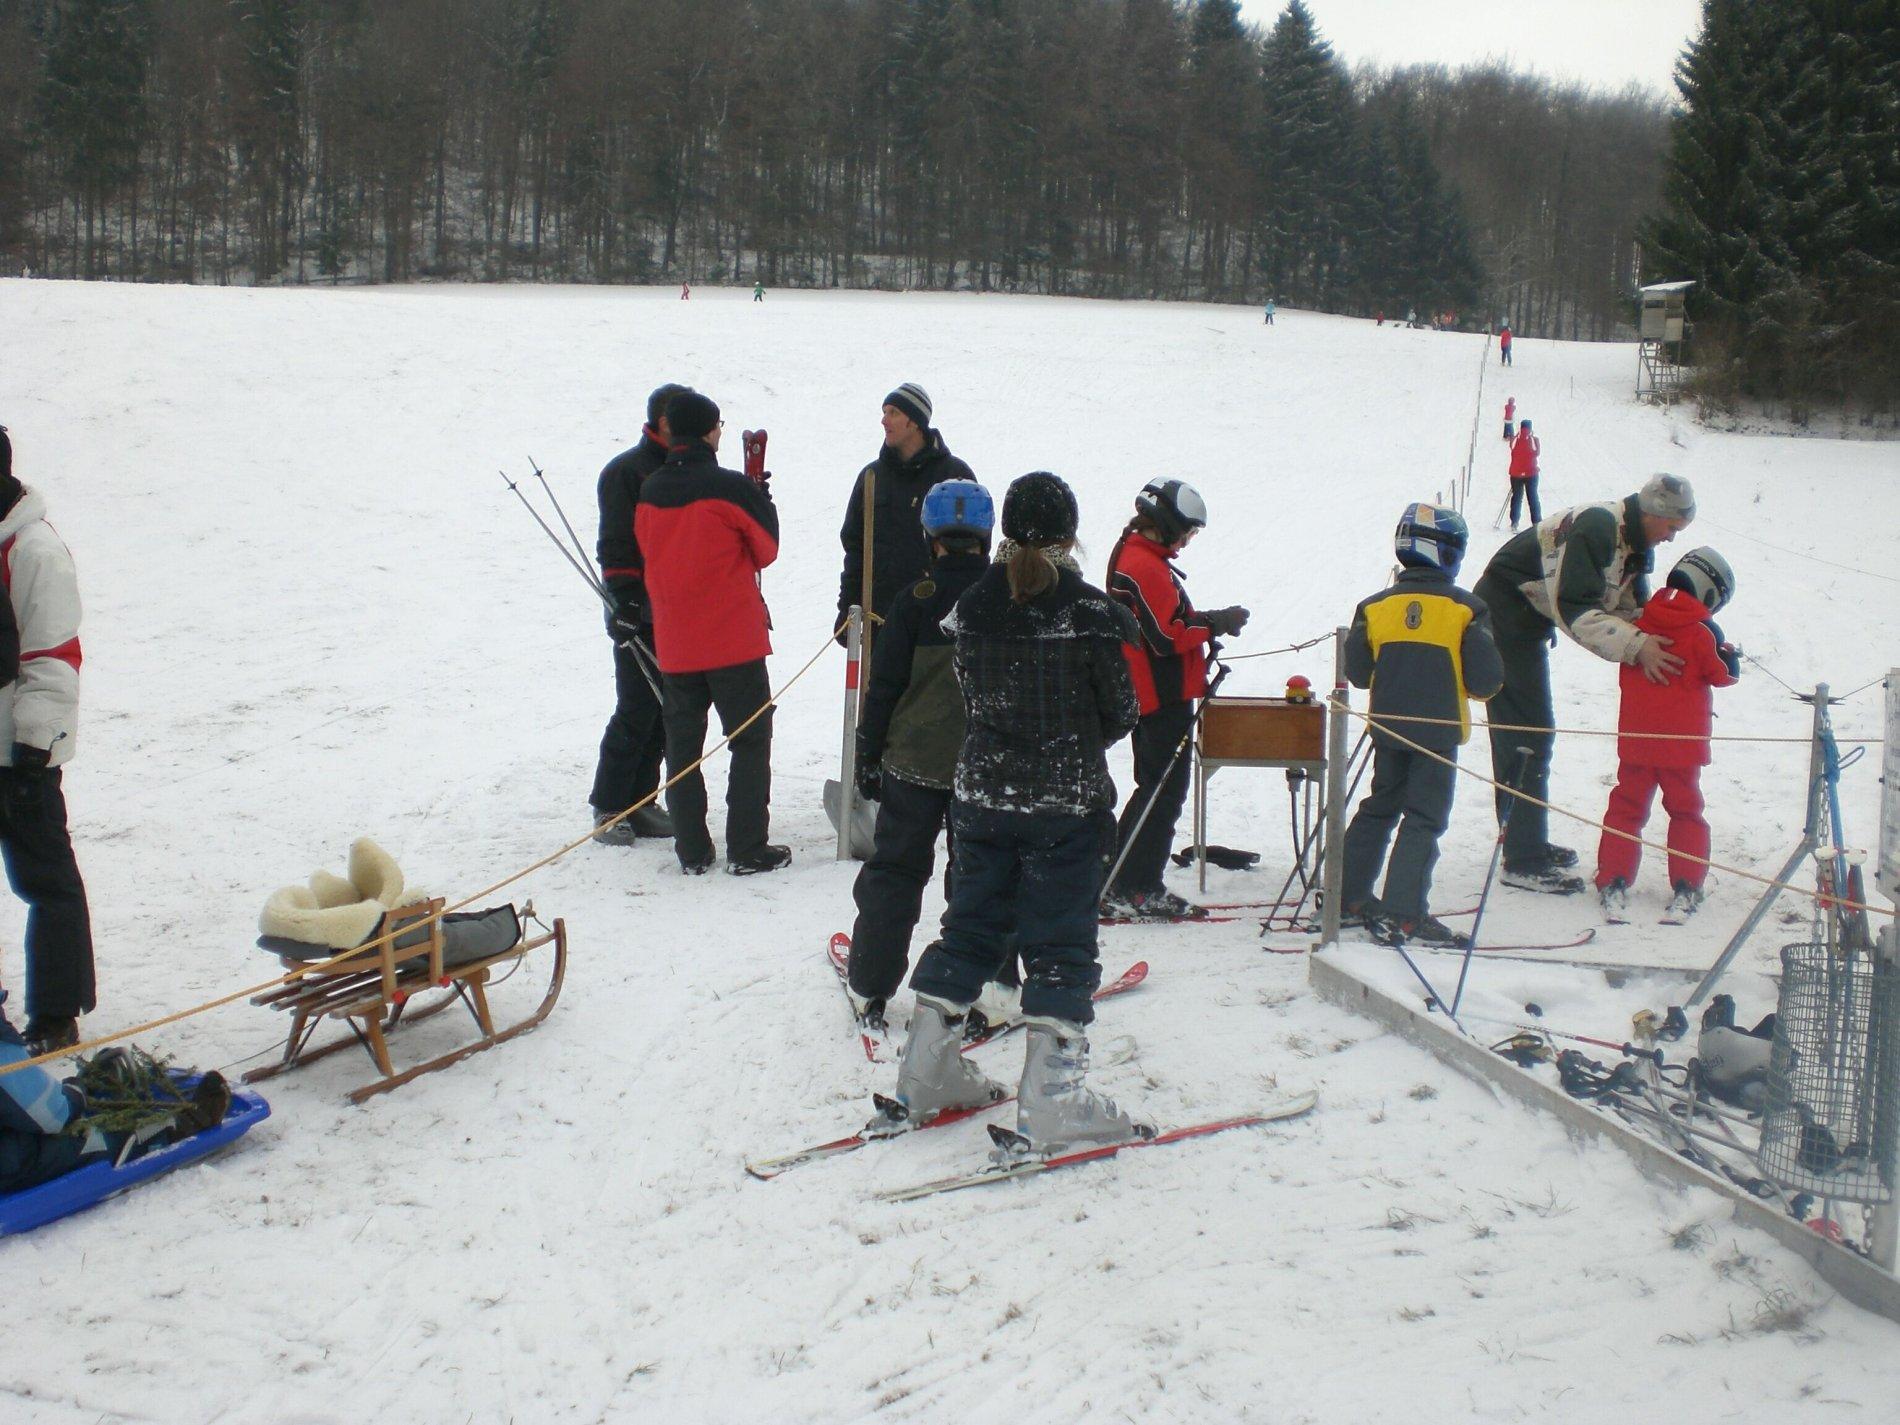 Liftbetrieb Ski-Club Vilsingen